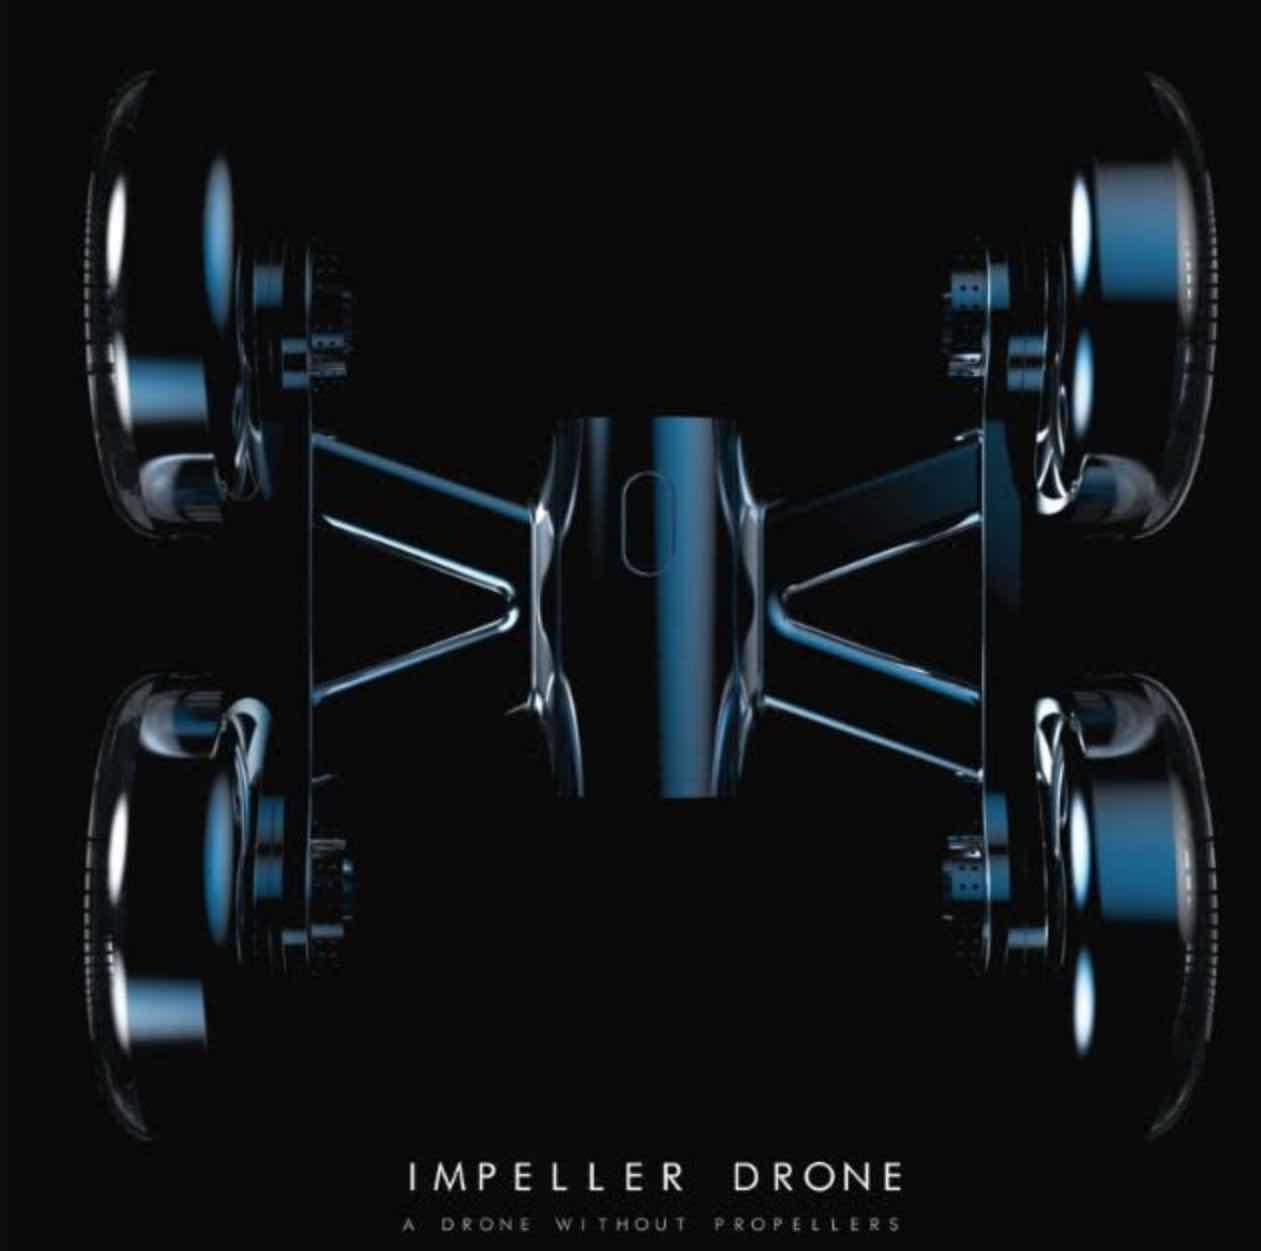 impeller drone